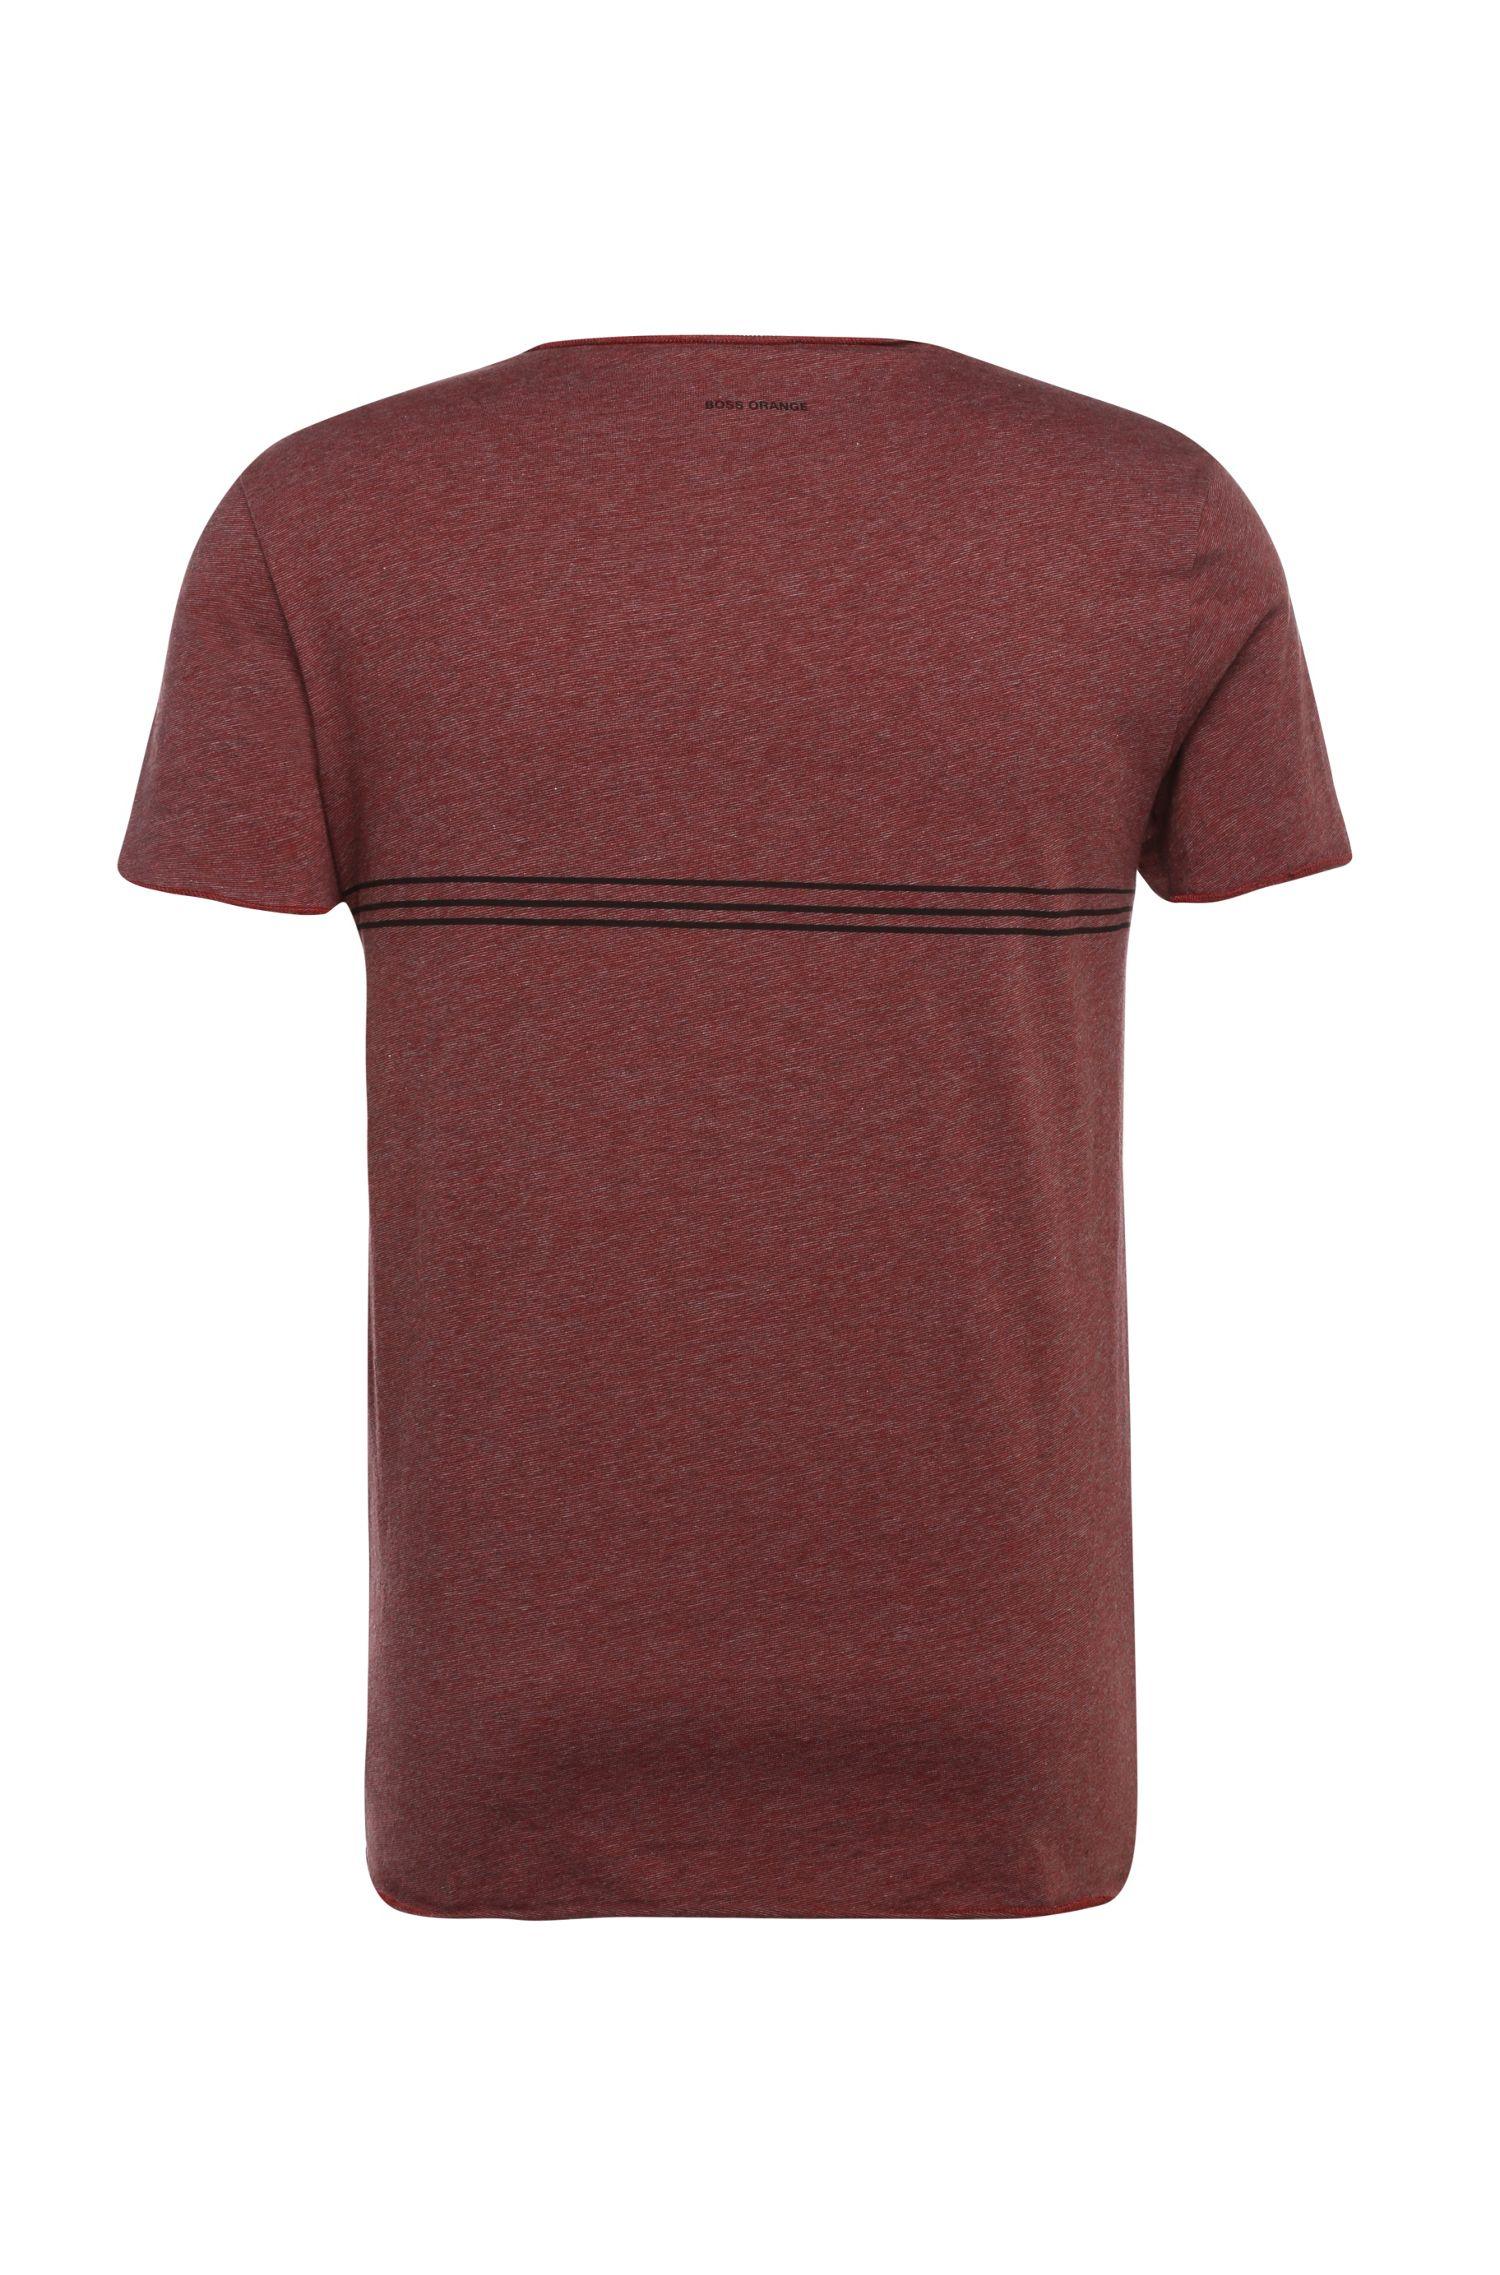 Bedrucktes Slim-Fit Baumwollshirt: ´Twiah`